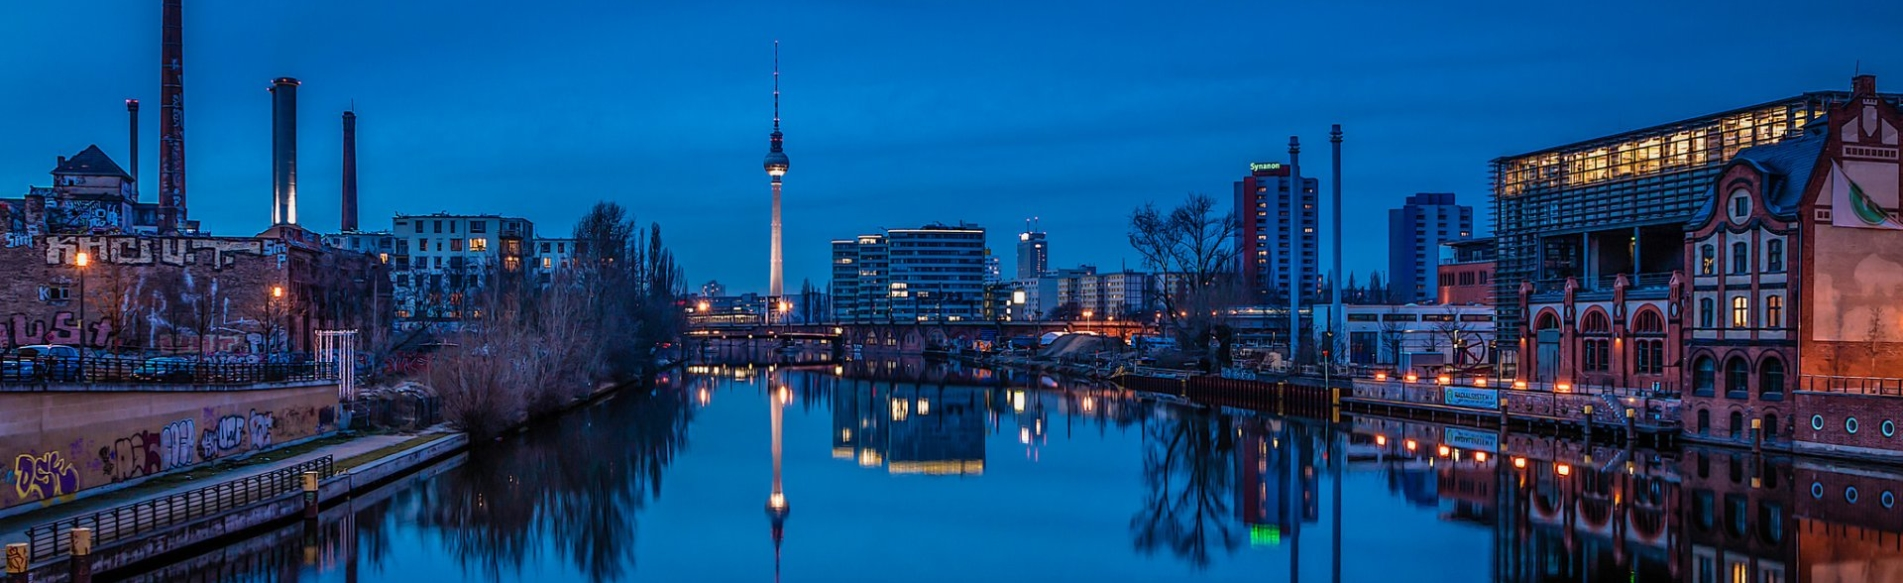 acama hotel & hostel Berlin